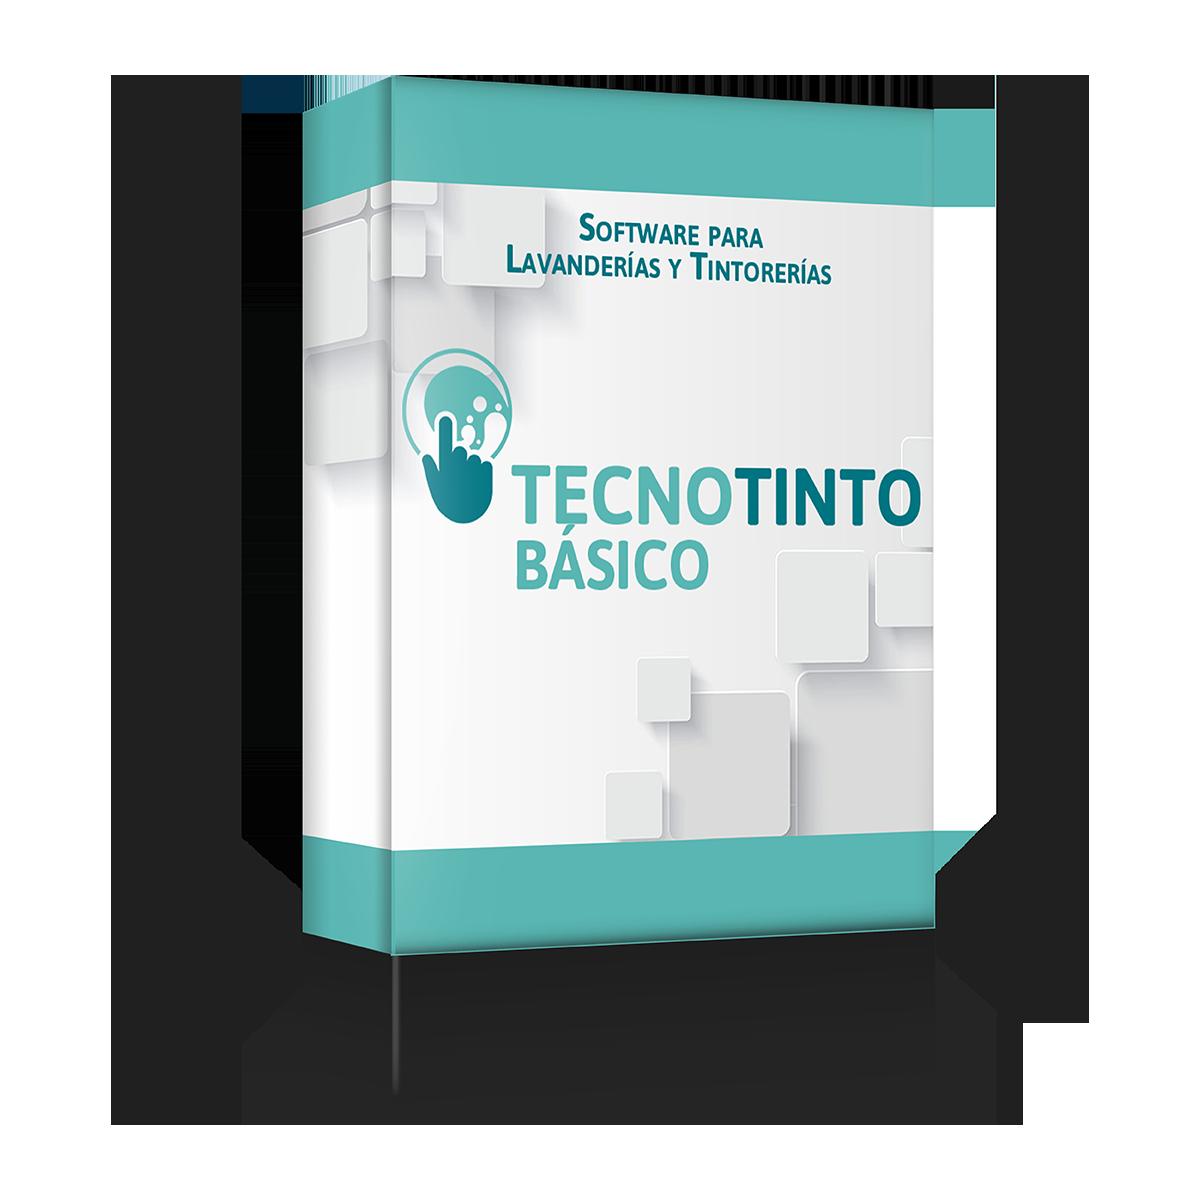 TecnoTinto-Basico